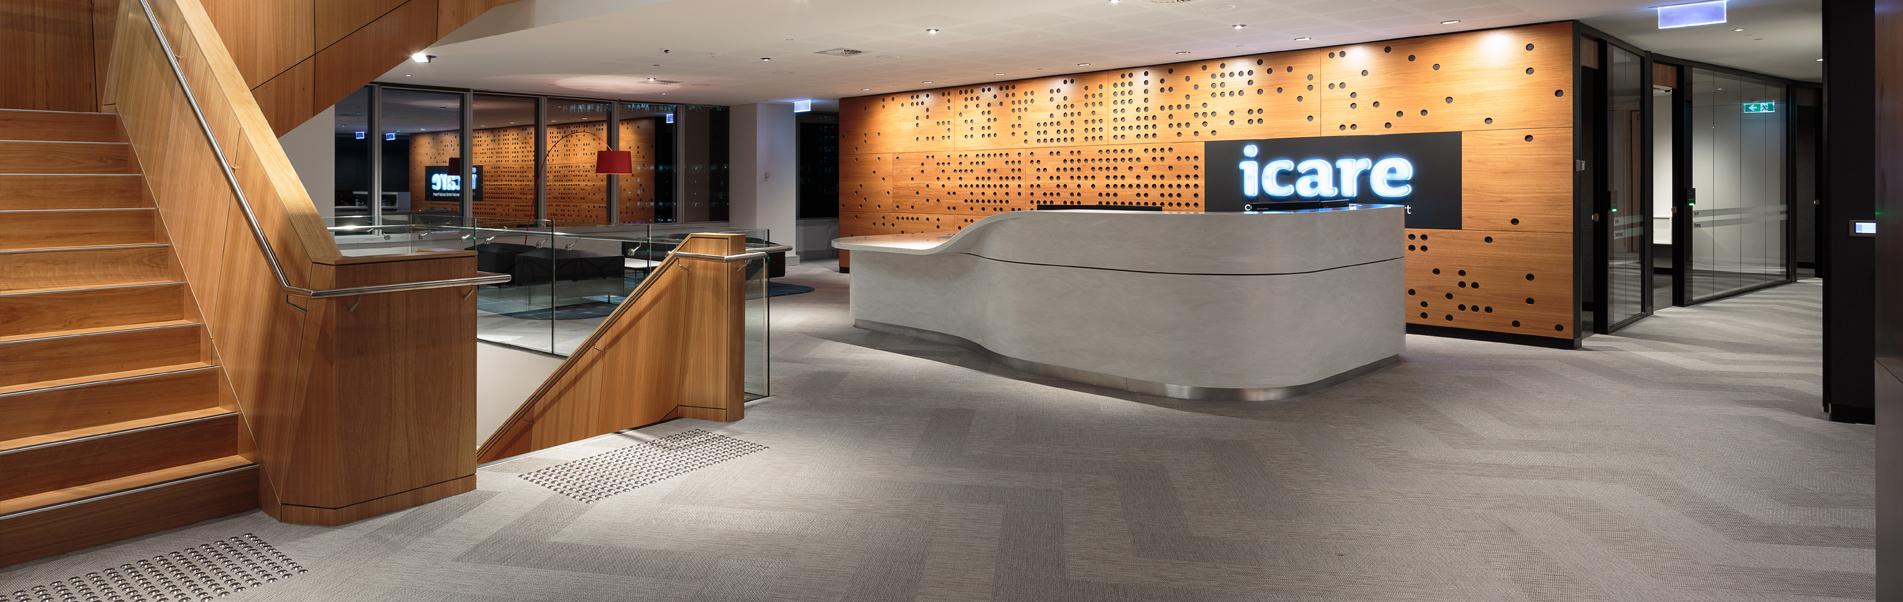 icare, Australia - Gallery (3)